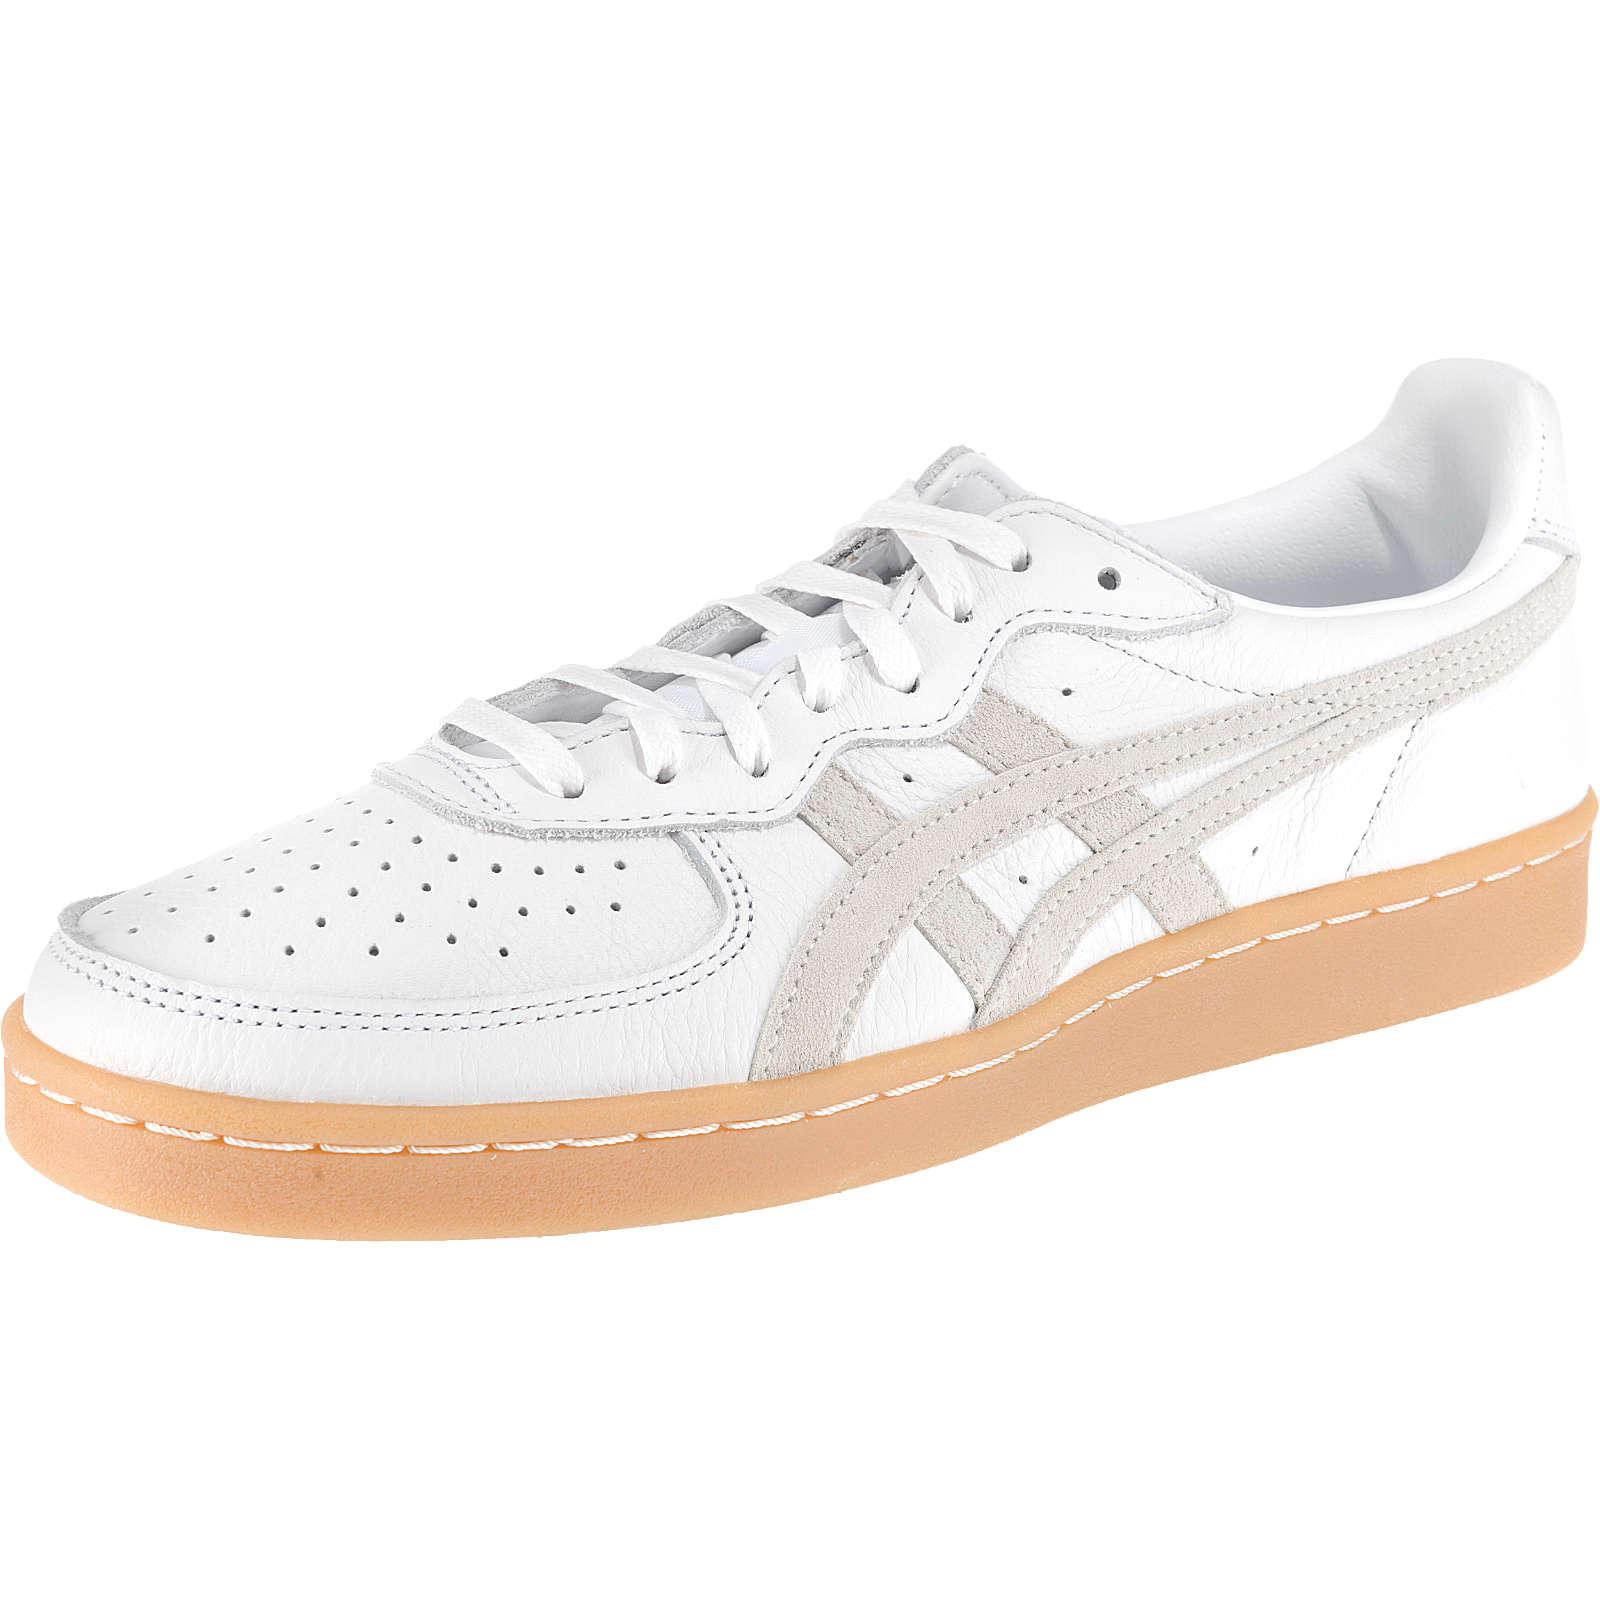 Onitsuka Tiger® GSM Sneakers Low weiß Herren Gr. 41,5